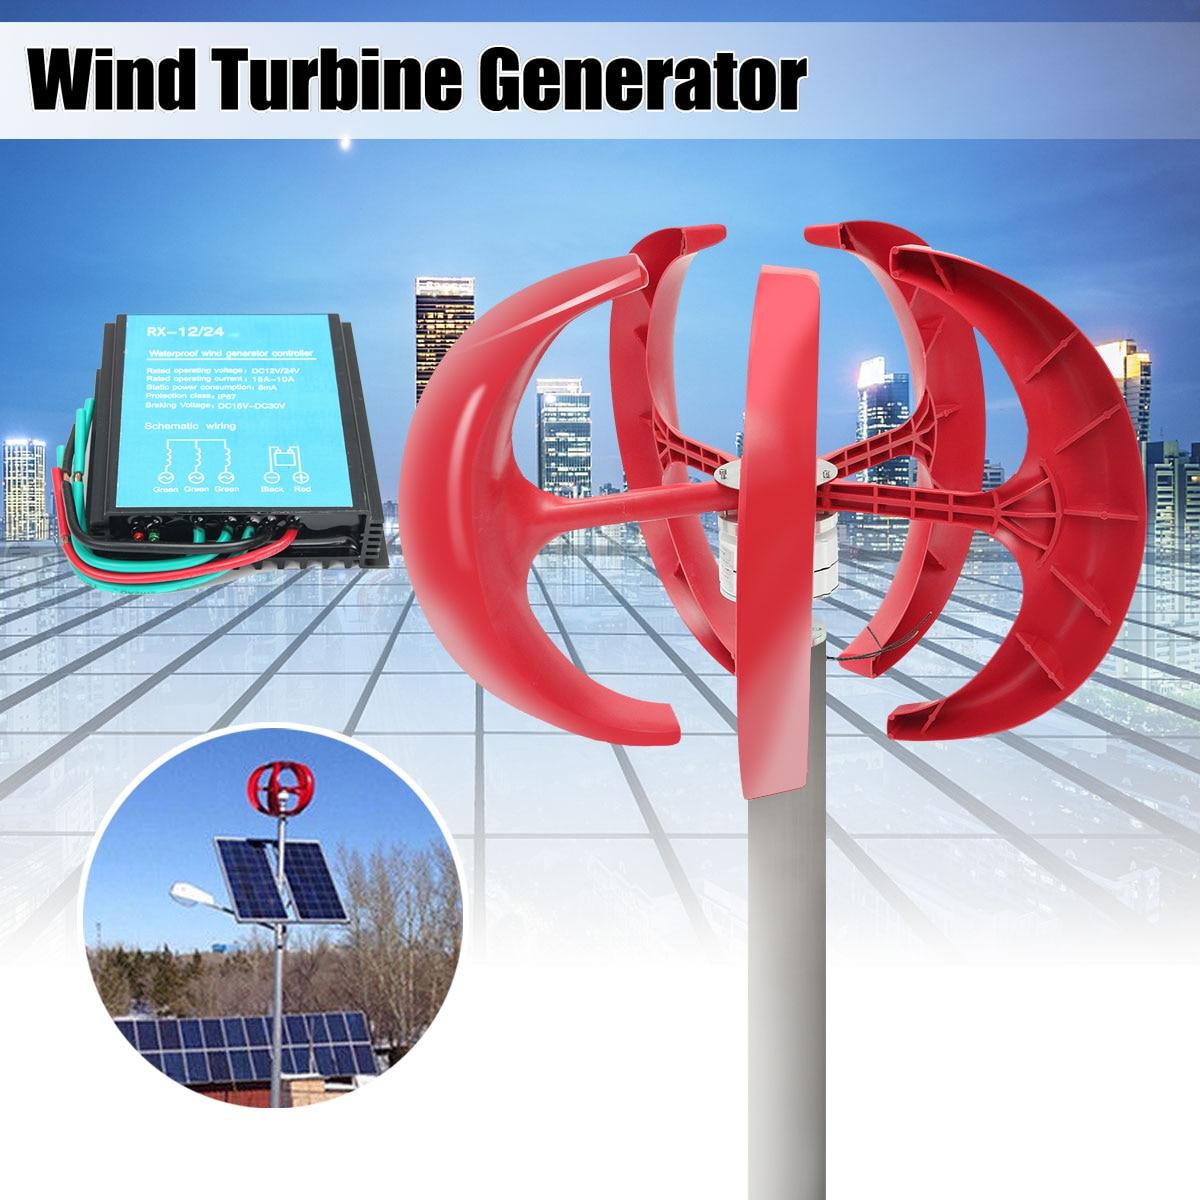 100W 200W 300W 400W Wind Generator Lantern 12V 24V 5 Blades Permanent Magnet Generator Turbine + 600W Wind Controller 12V 24V 100w 200w 300w 400w lantern wind turbine generator dc 12v 24v wind power permanent magnet generator 600w wind energy controller